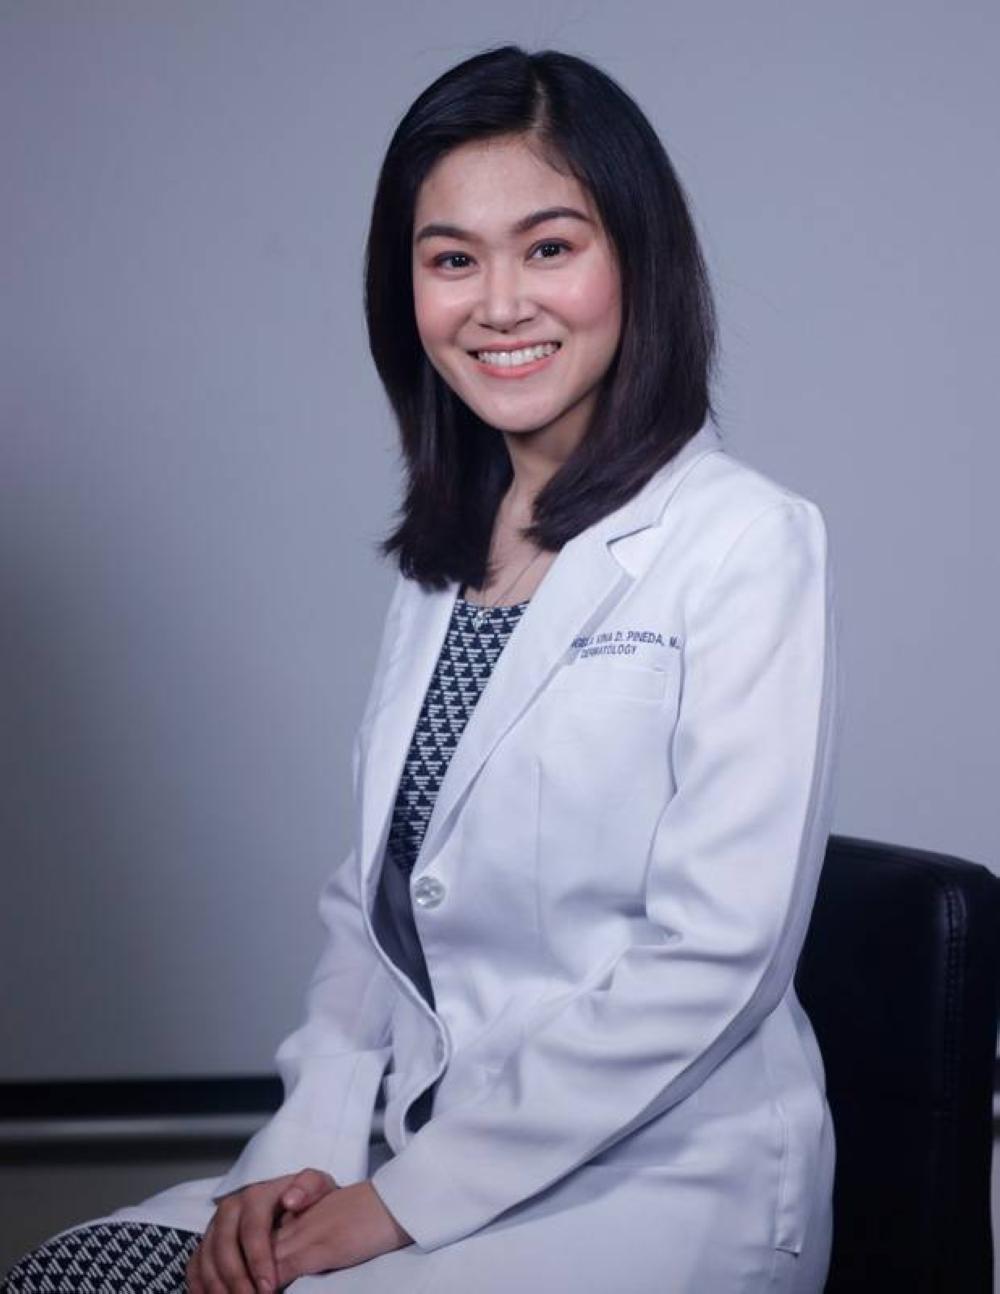 DR. MA. ANGELA VINA D. PINEDA Executive Vice President Dermclinic